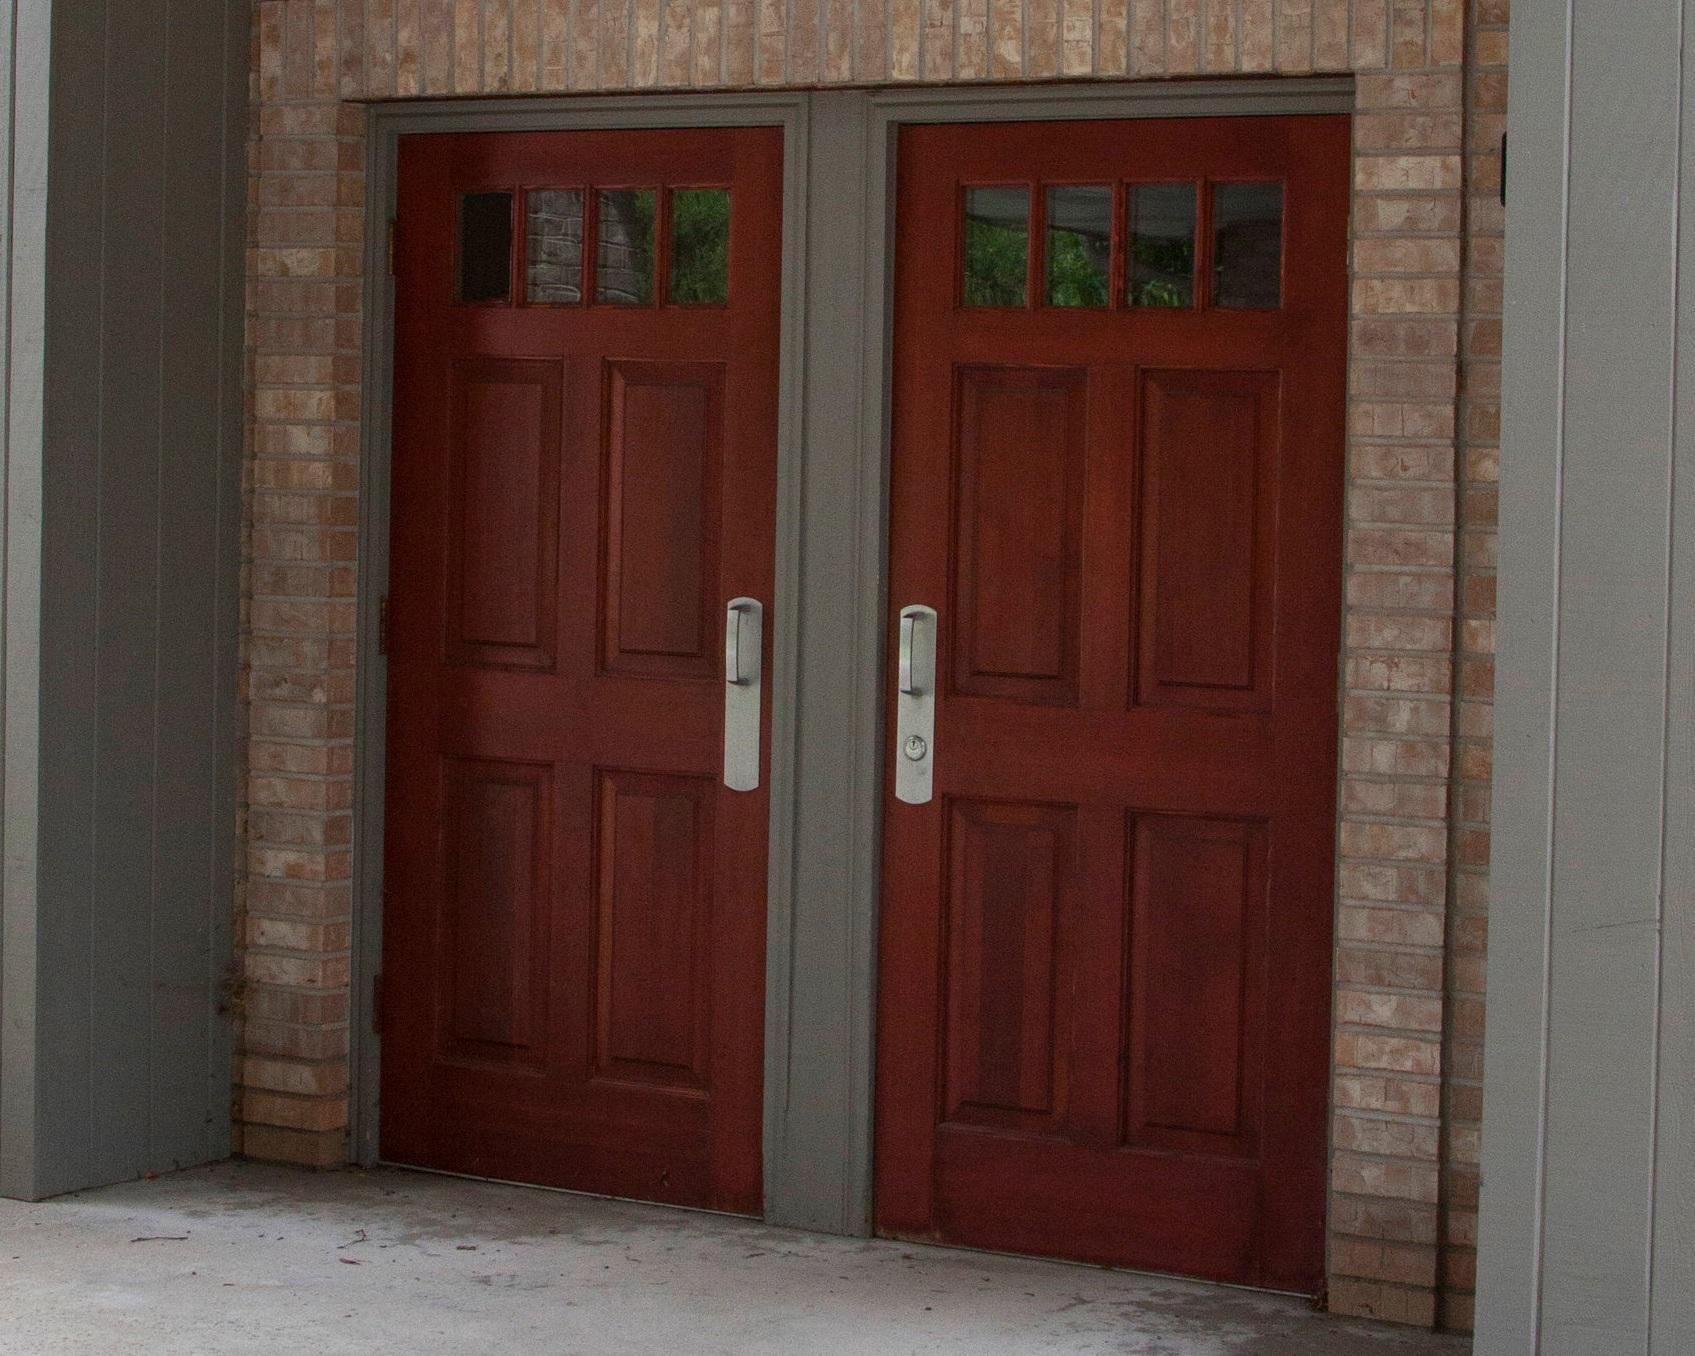 St Michaels Anglican Church Doors.jpg